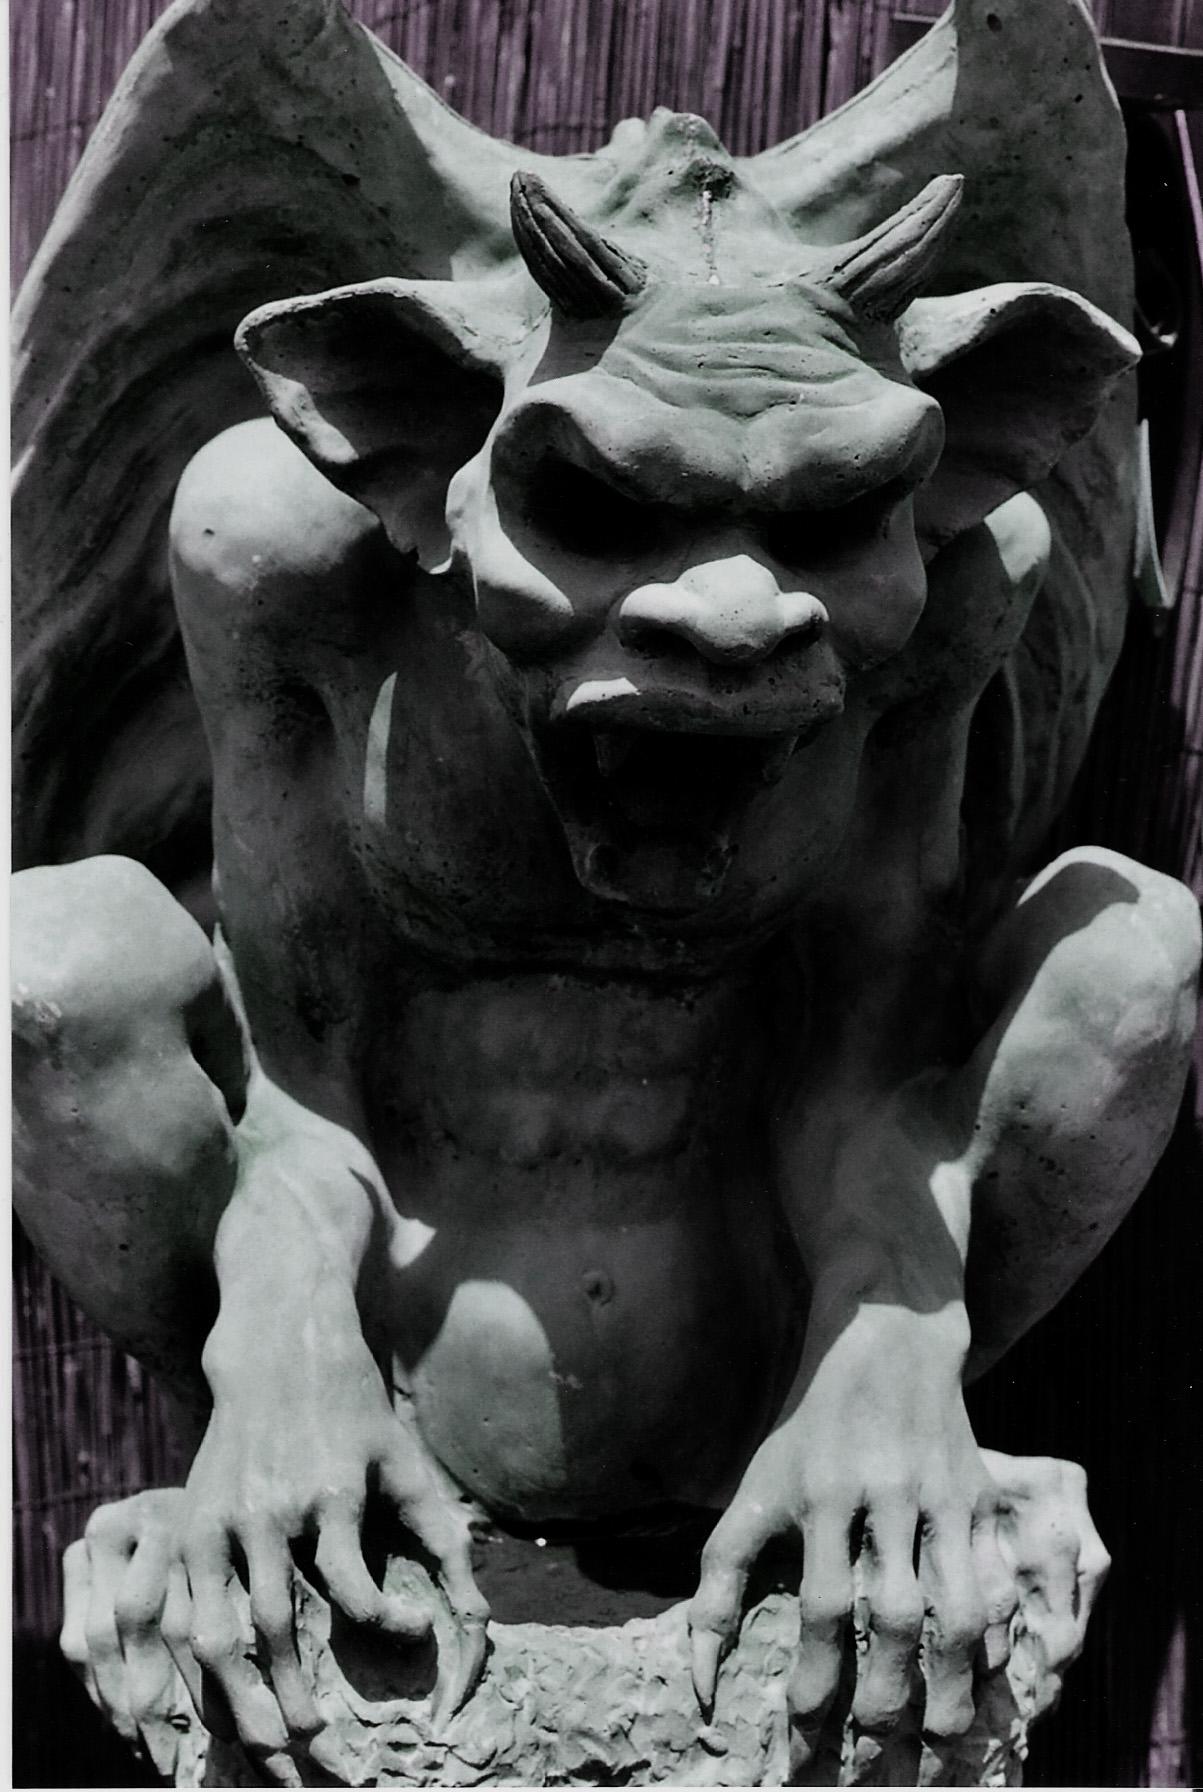 Gargoyle Pics, Dark Collection